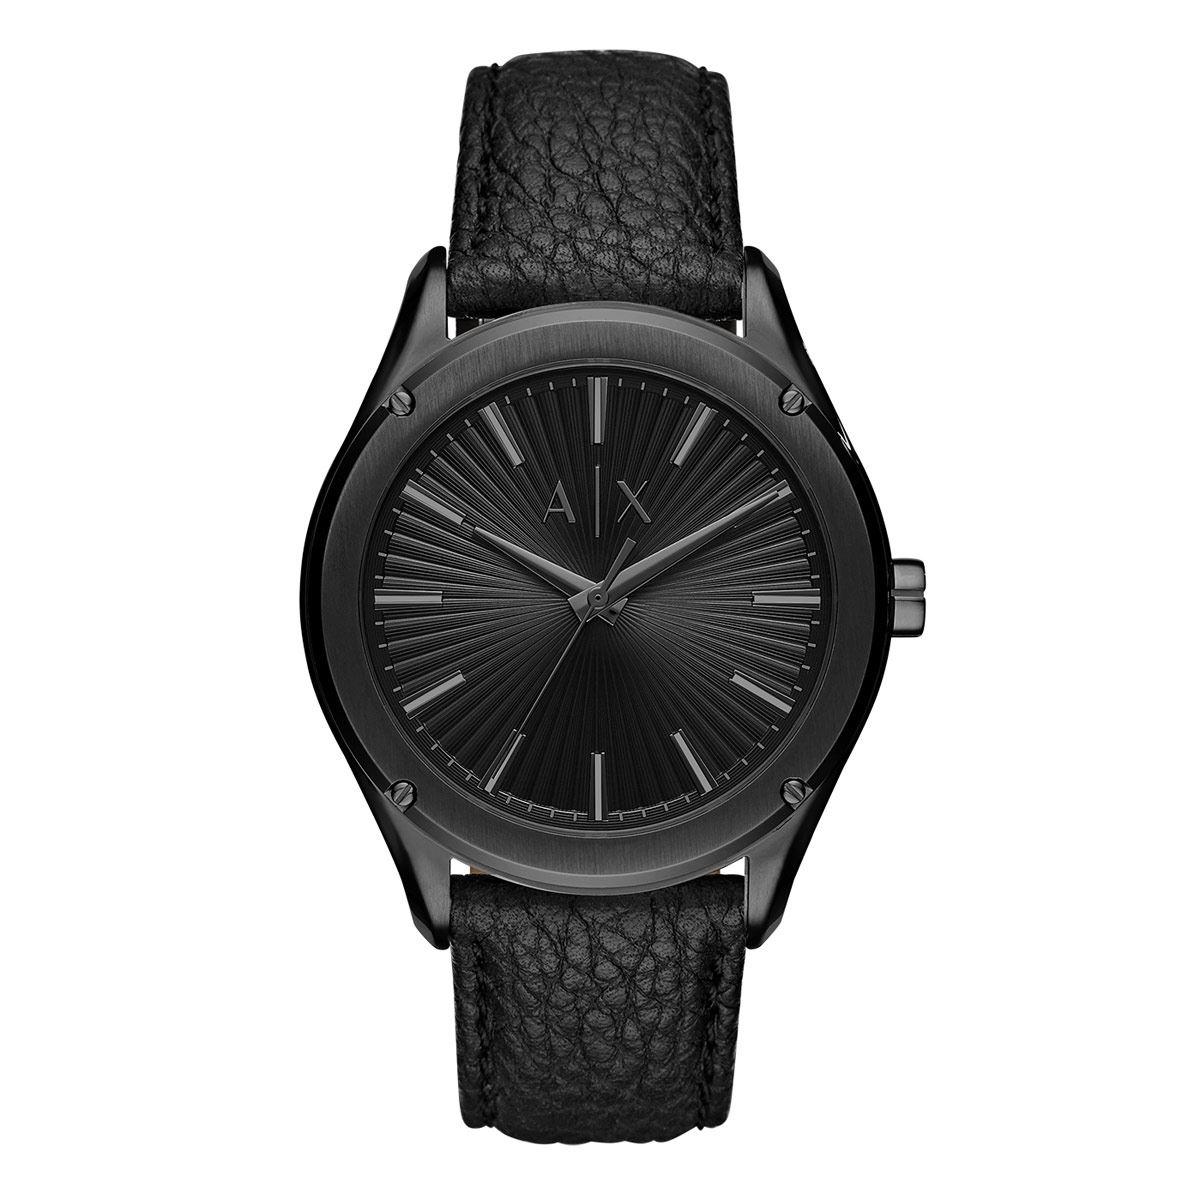 Reloj Armani Exchange AX2805 Color Negro Para Caballero